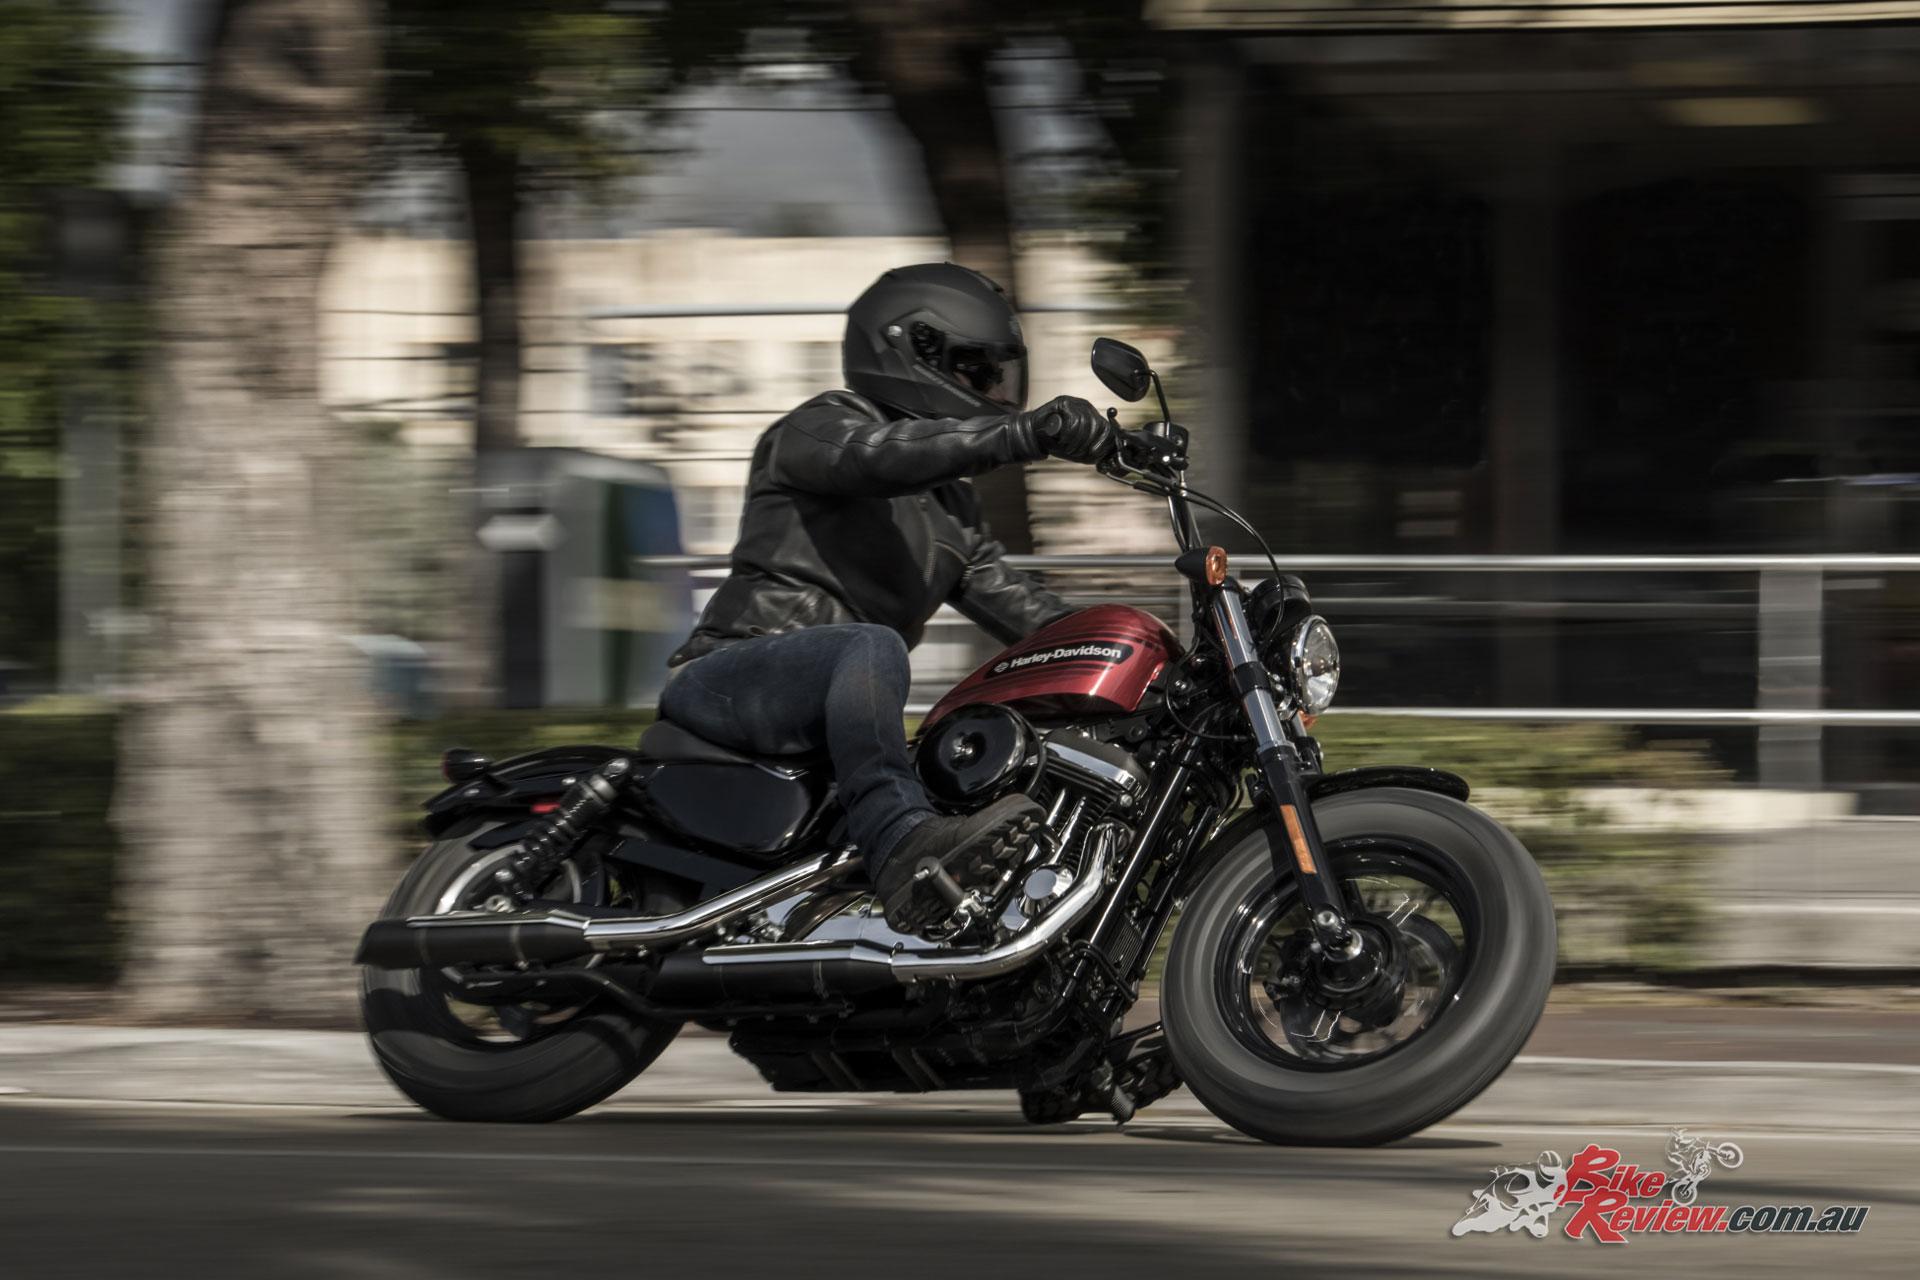 Harley Davidson Smart Security System Review